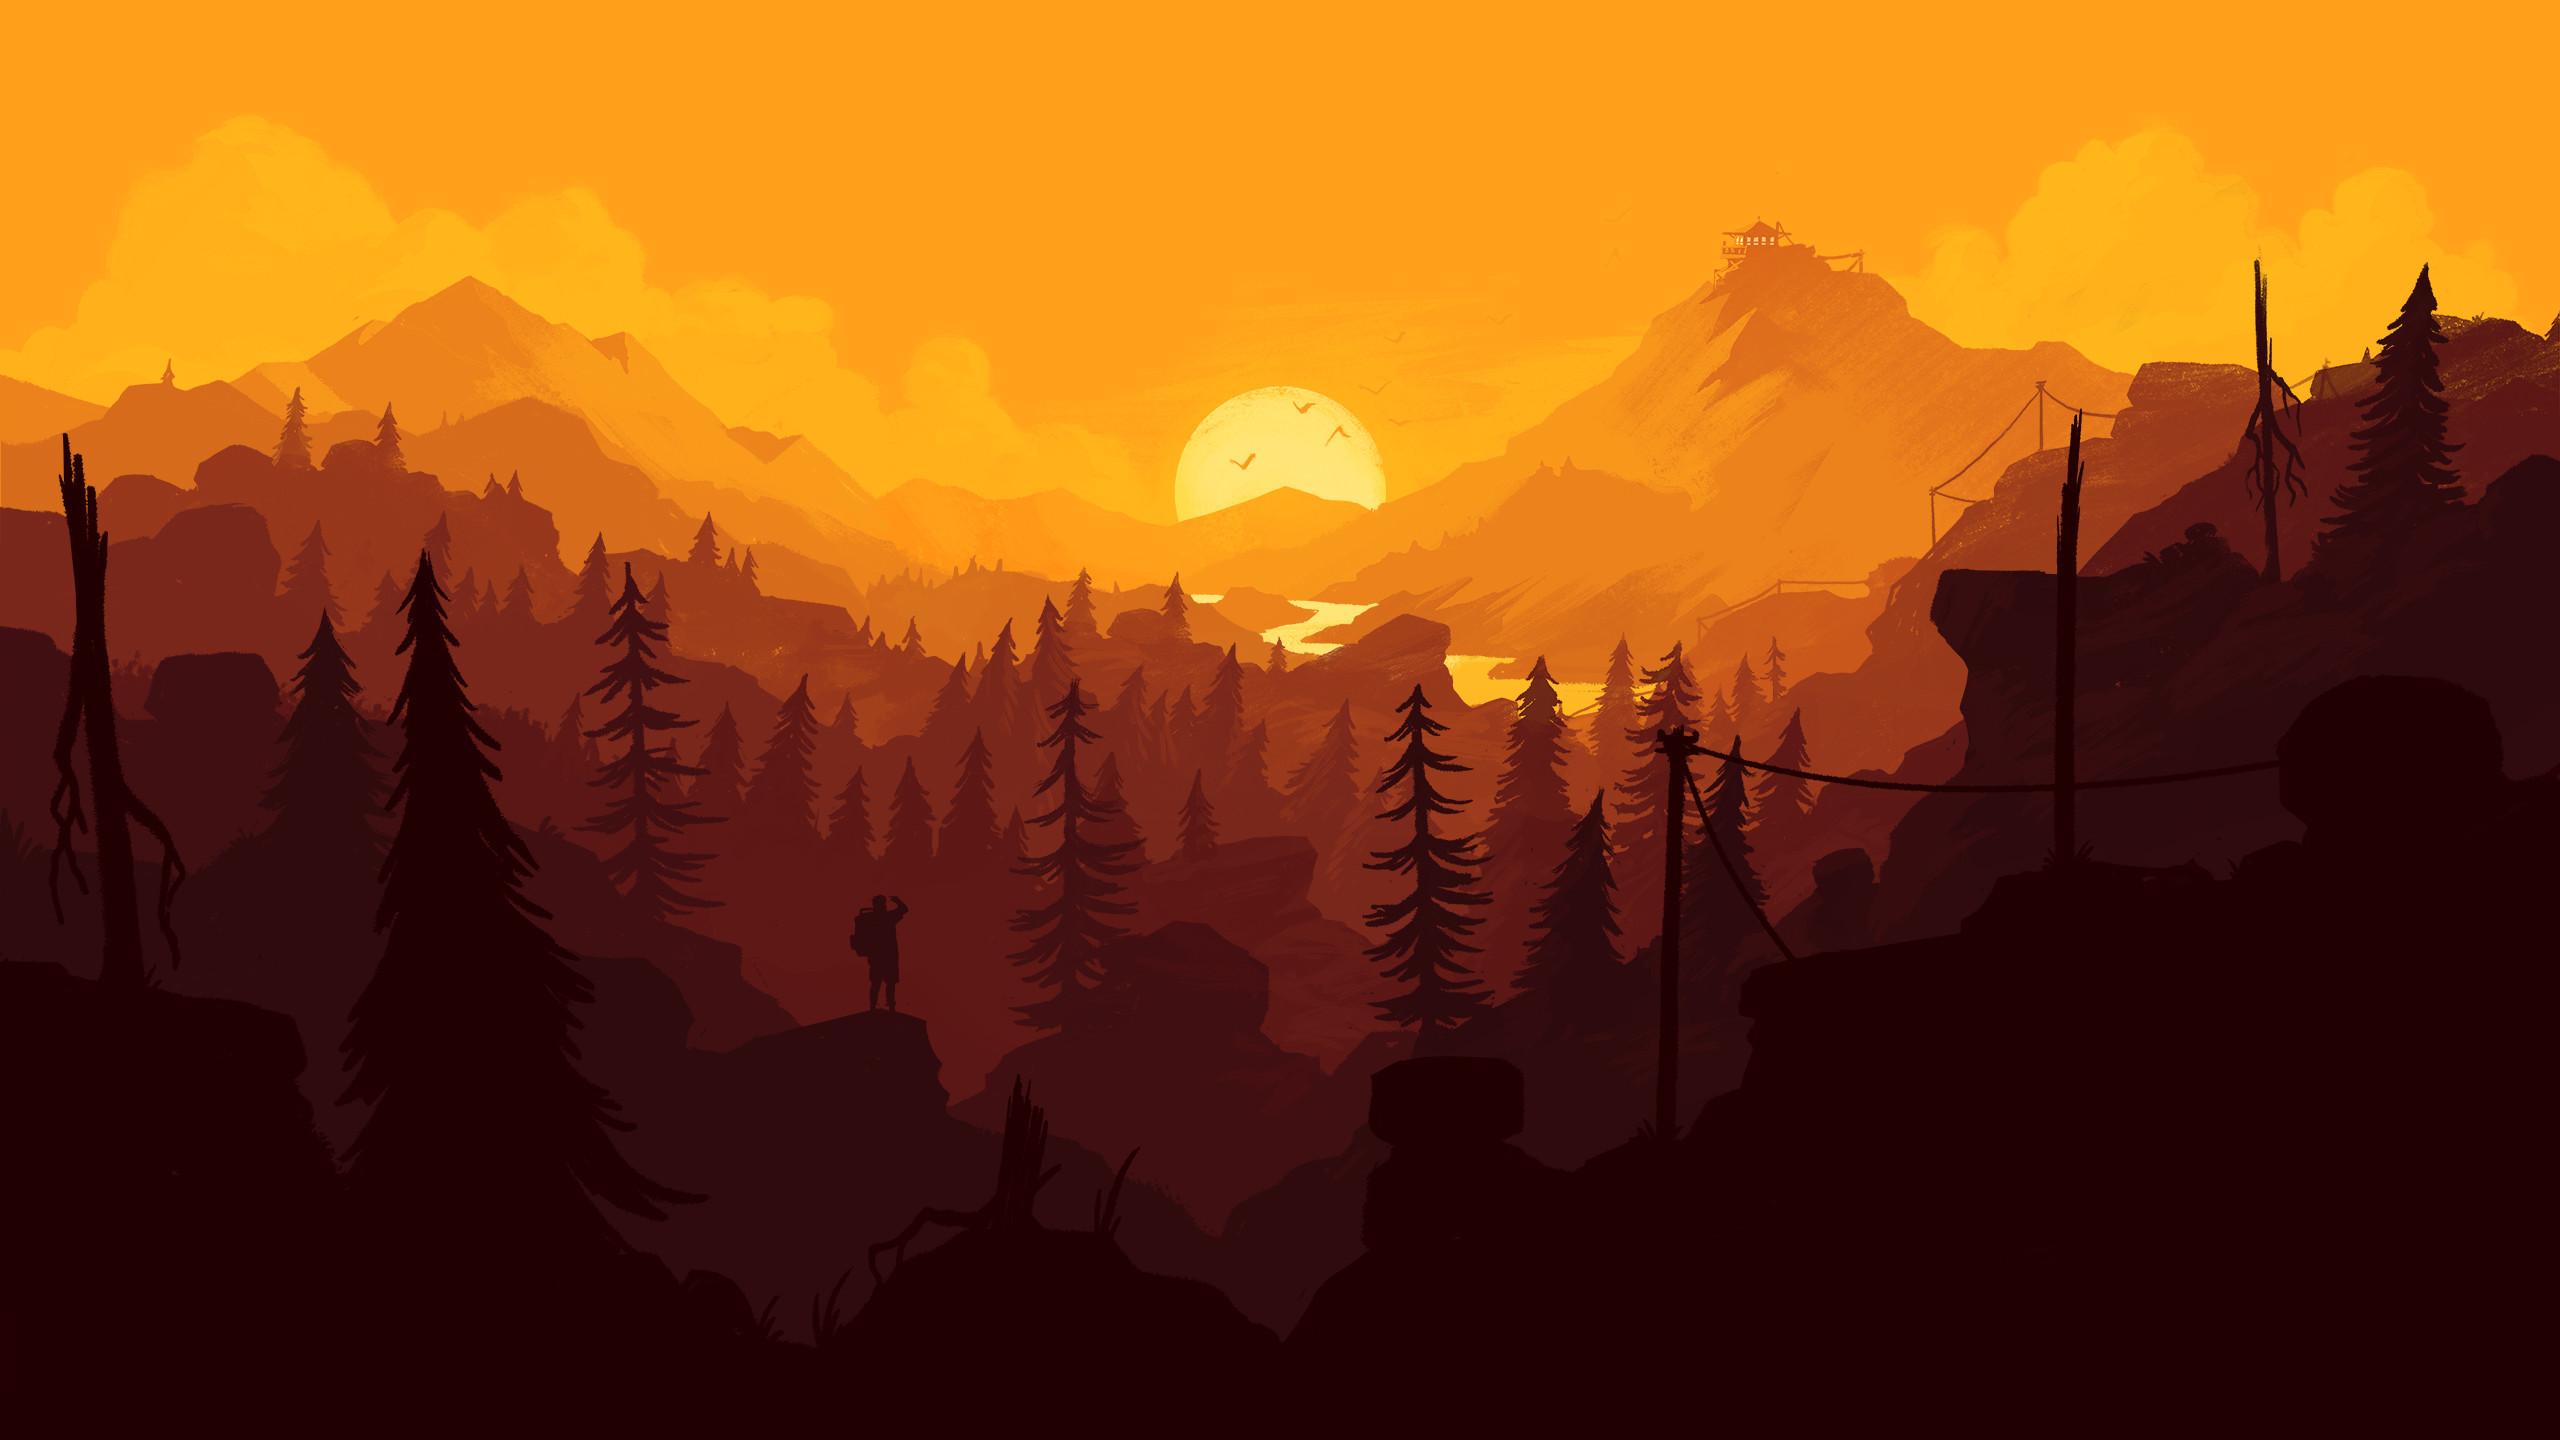 Res: 2560x1440, Firewatch Wallpaper desktop  orange